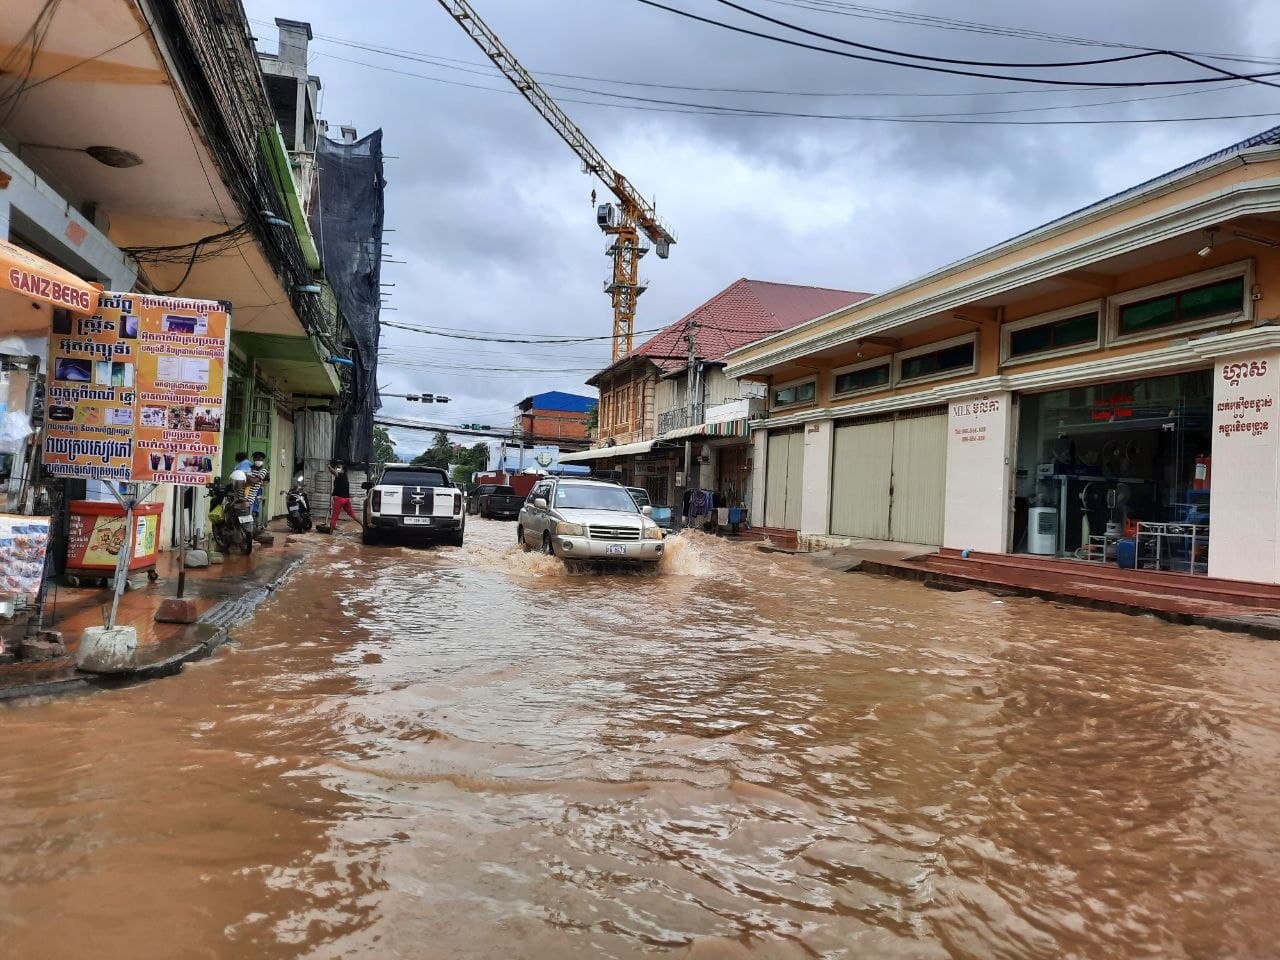 Heavy rain and floods from Thailand hit Battambang town. Photo taken on October 18, 2021. In Kongchet